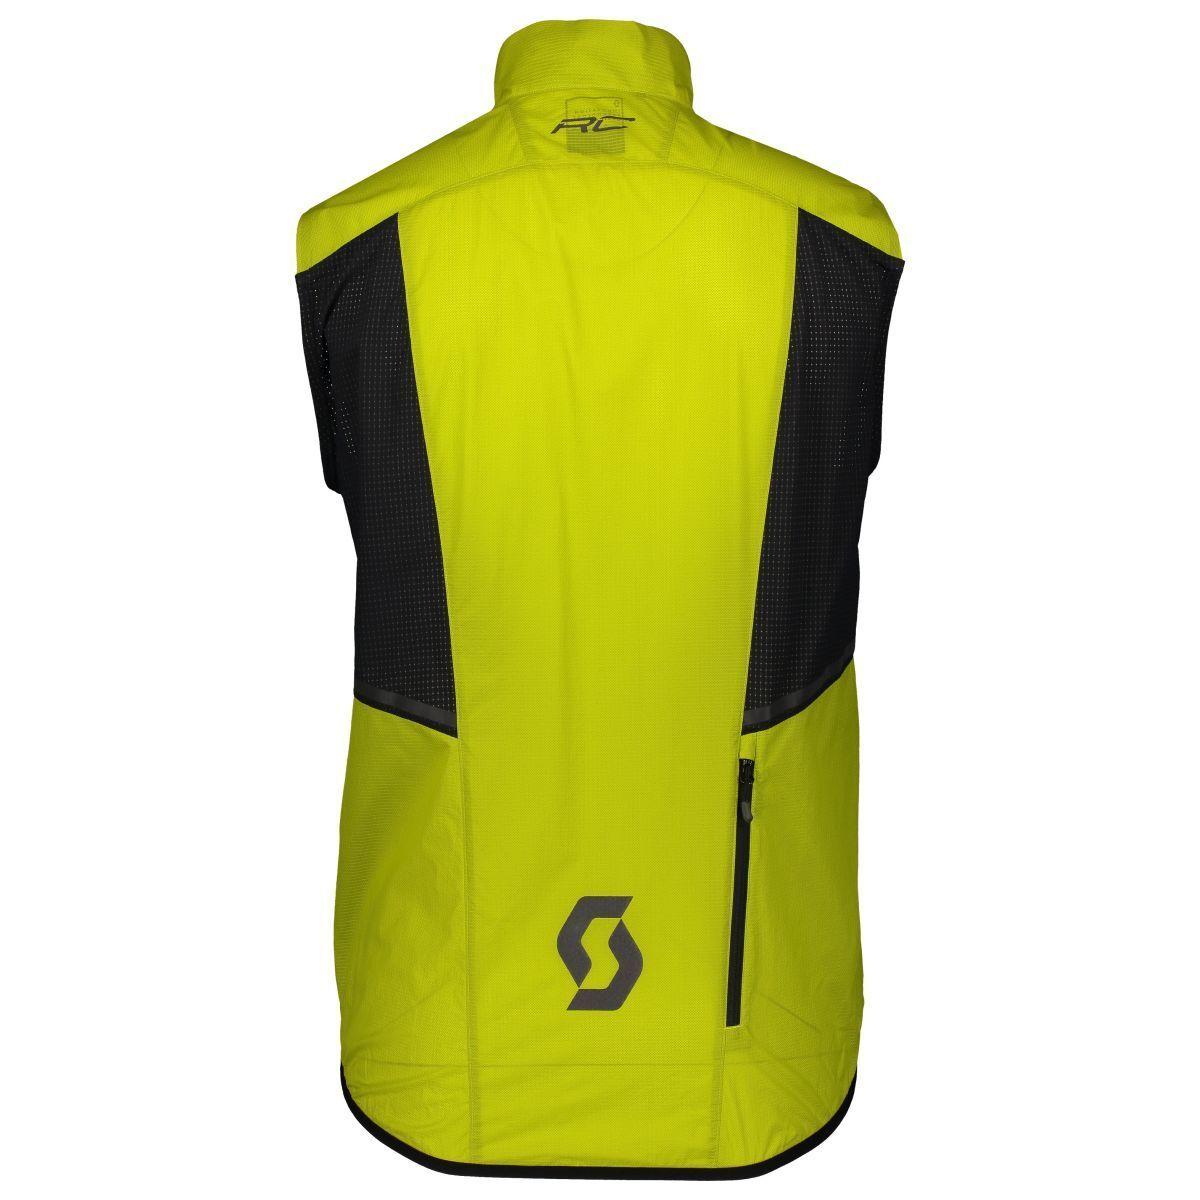 Scott RC Weather Fahrrad Windweste gelb gelb gelb 2019 b43c18